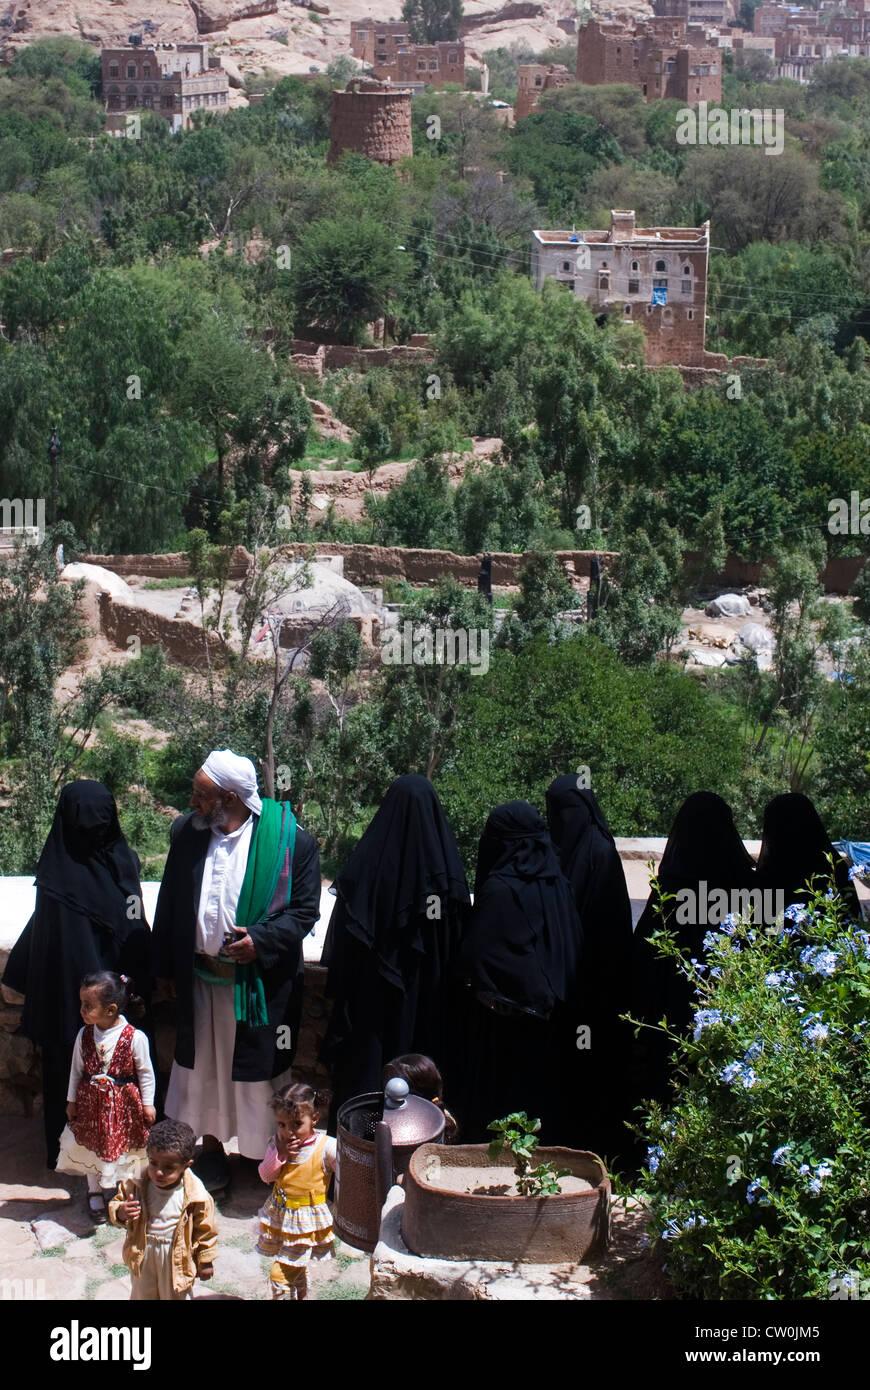 People in the Dar Al Hajar the rock palace in Wadi Dhahr, Yemen, Western Asia, Arabian Peninsula. - Stock Image